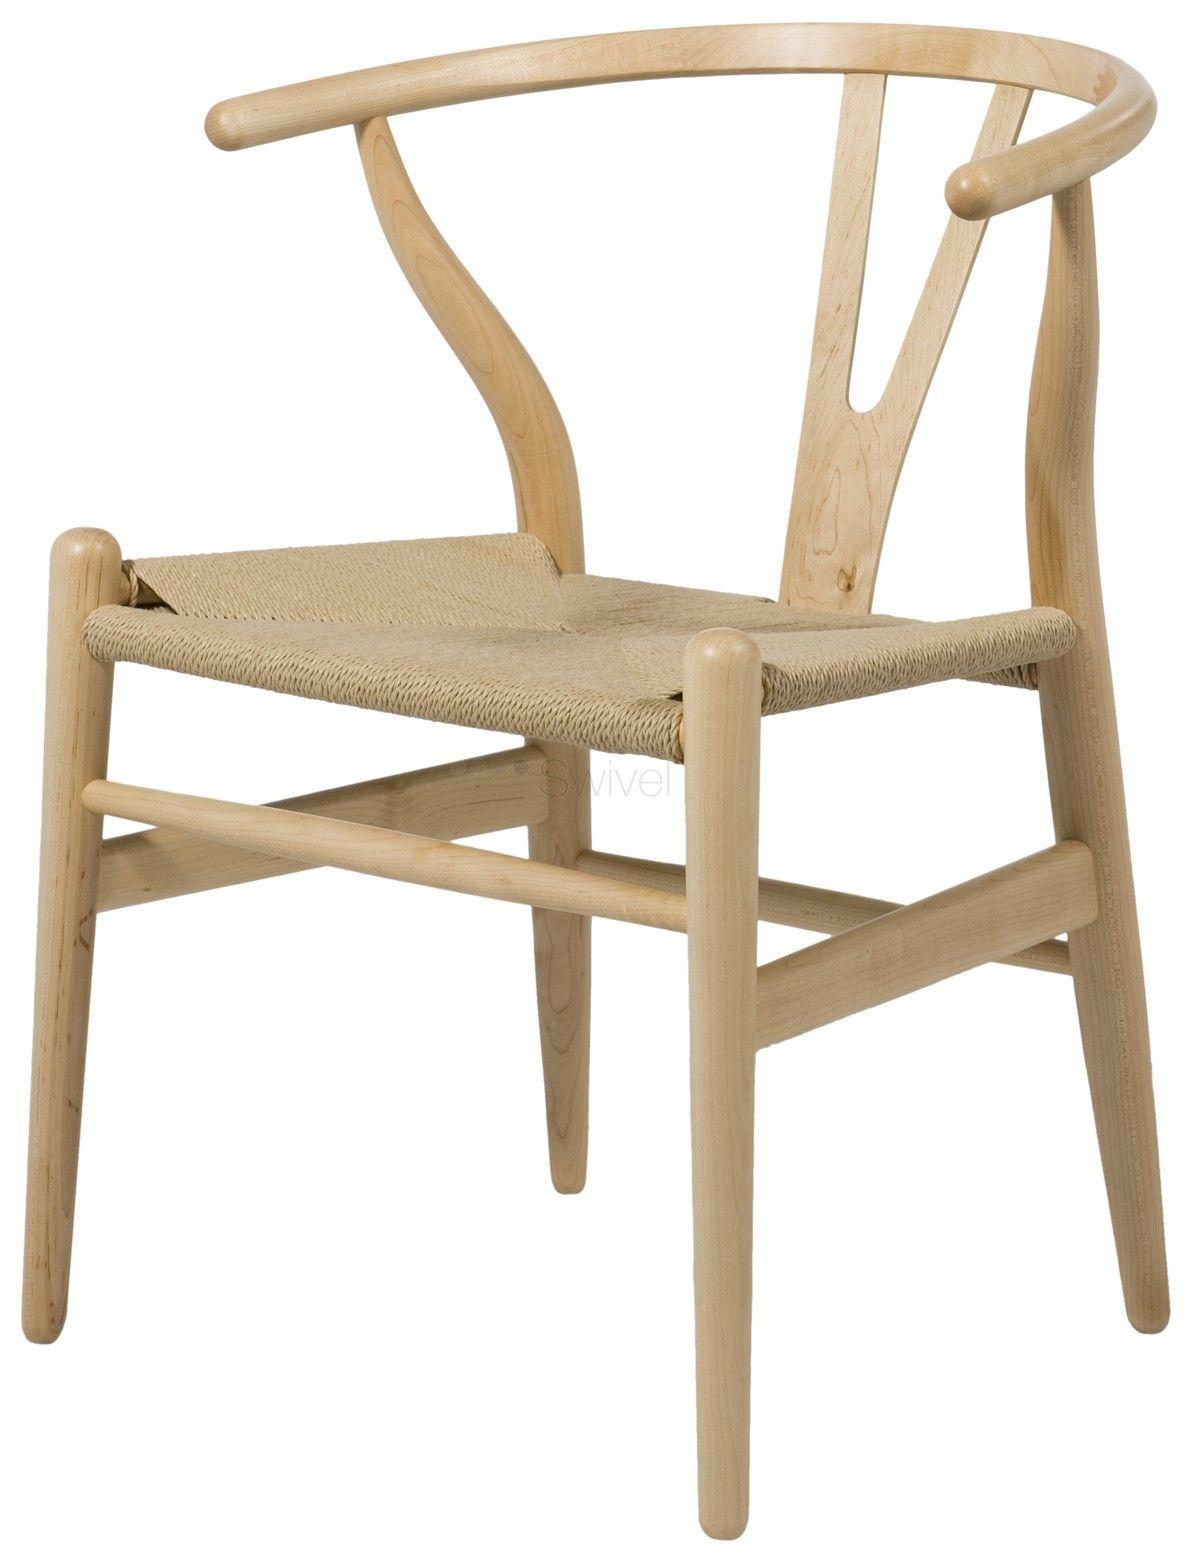 hans wegner wishbone chair - google search | chairs | pinterest